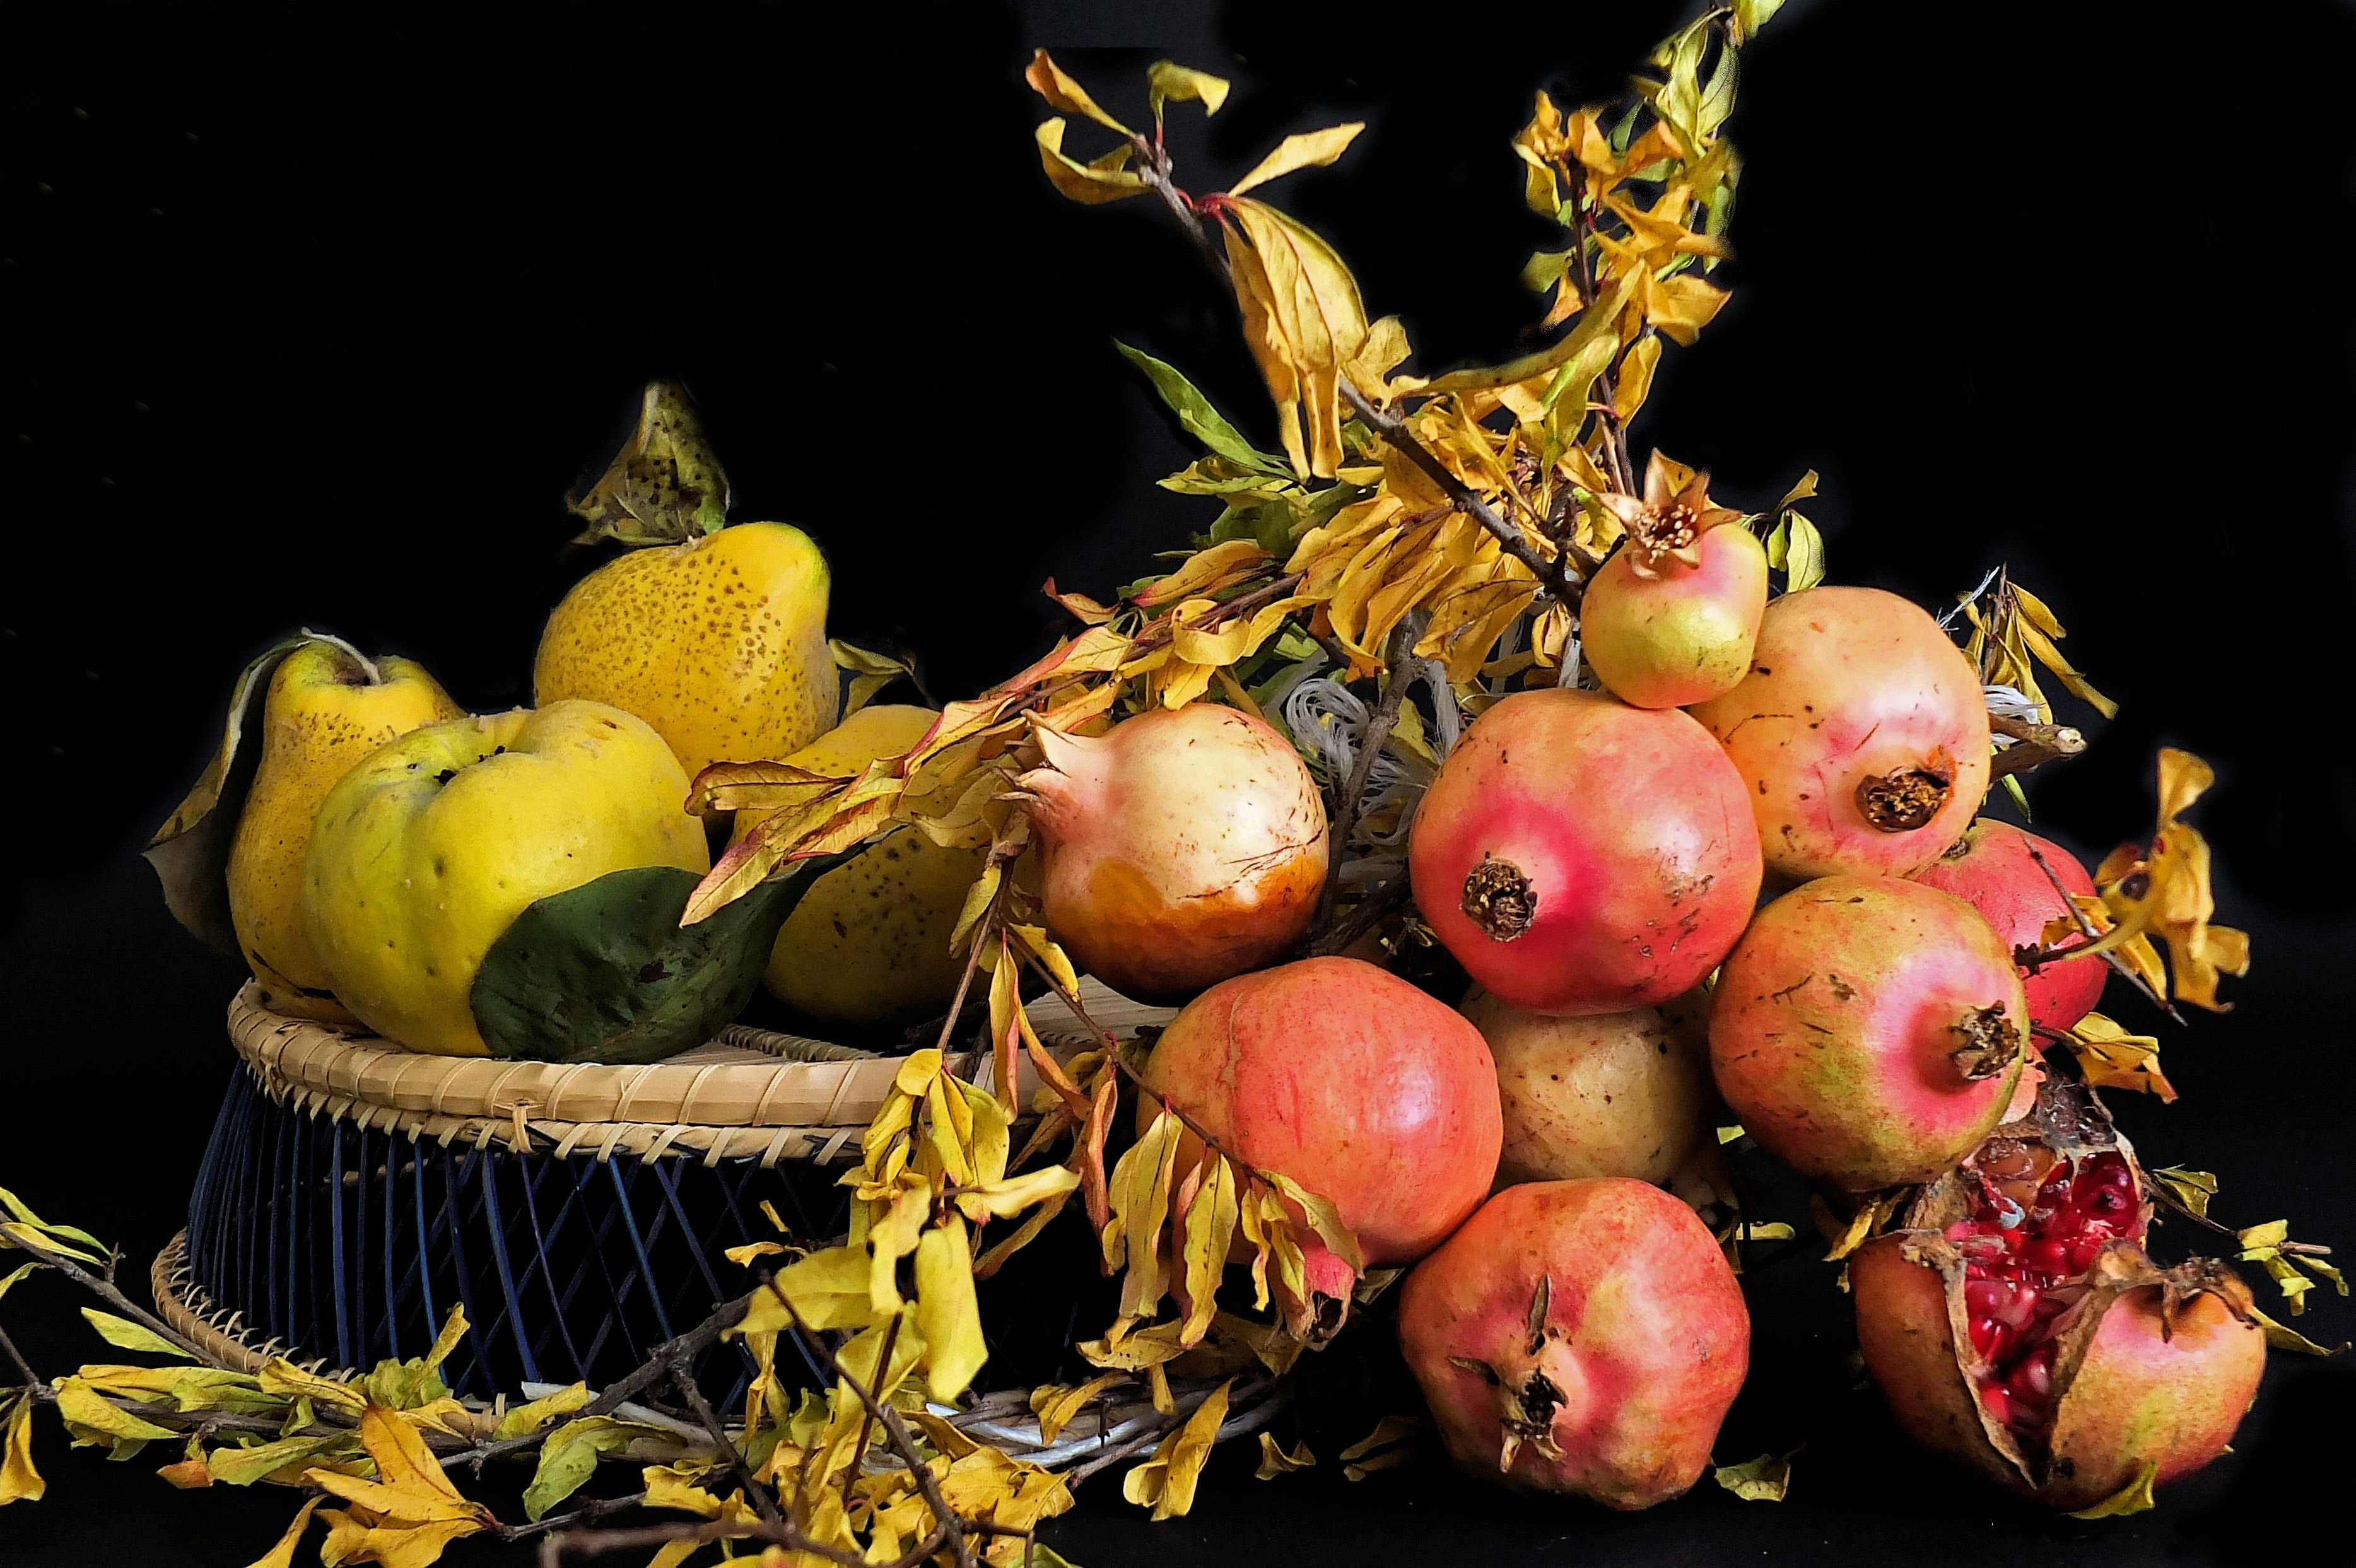 еда графика натюрморт фрукты food graphics still life fruit бесплатно